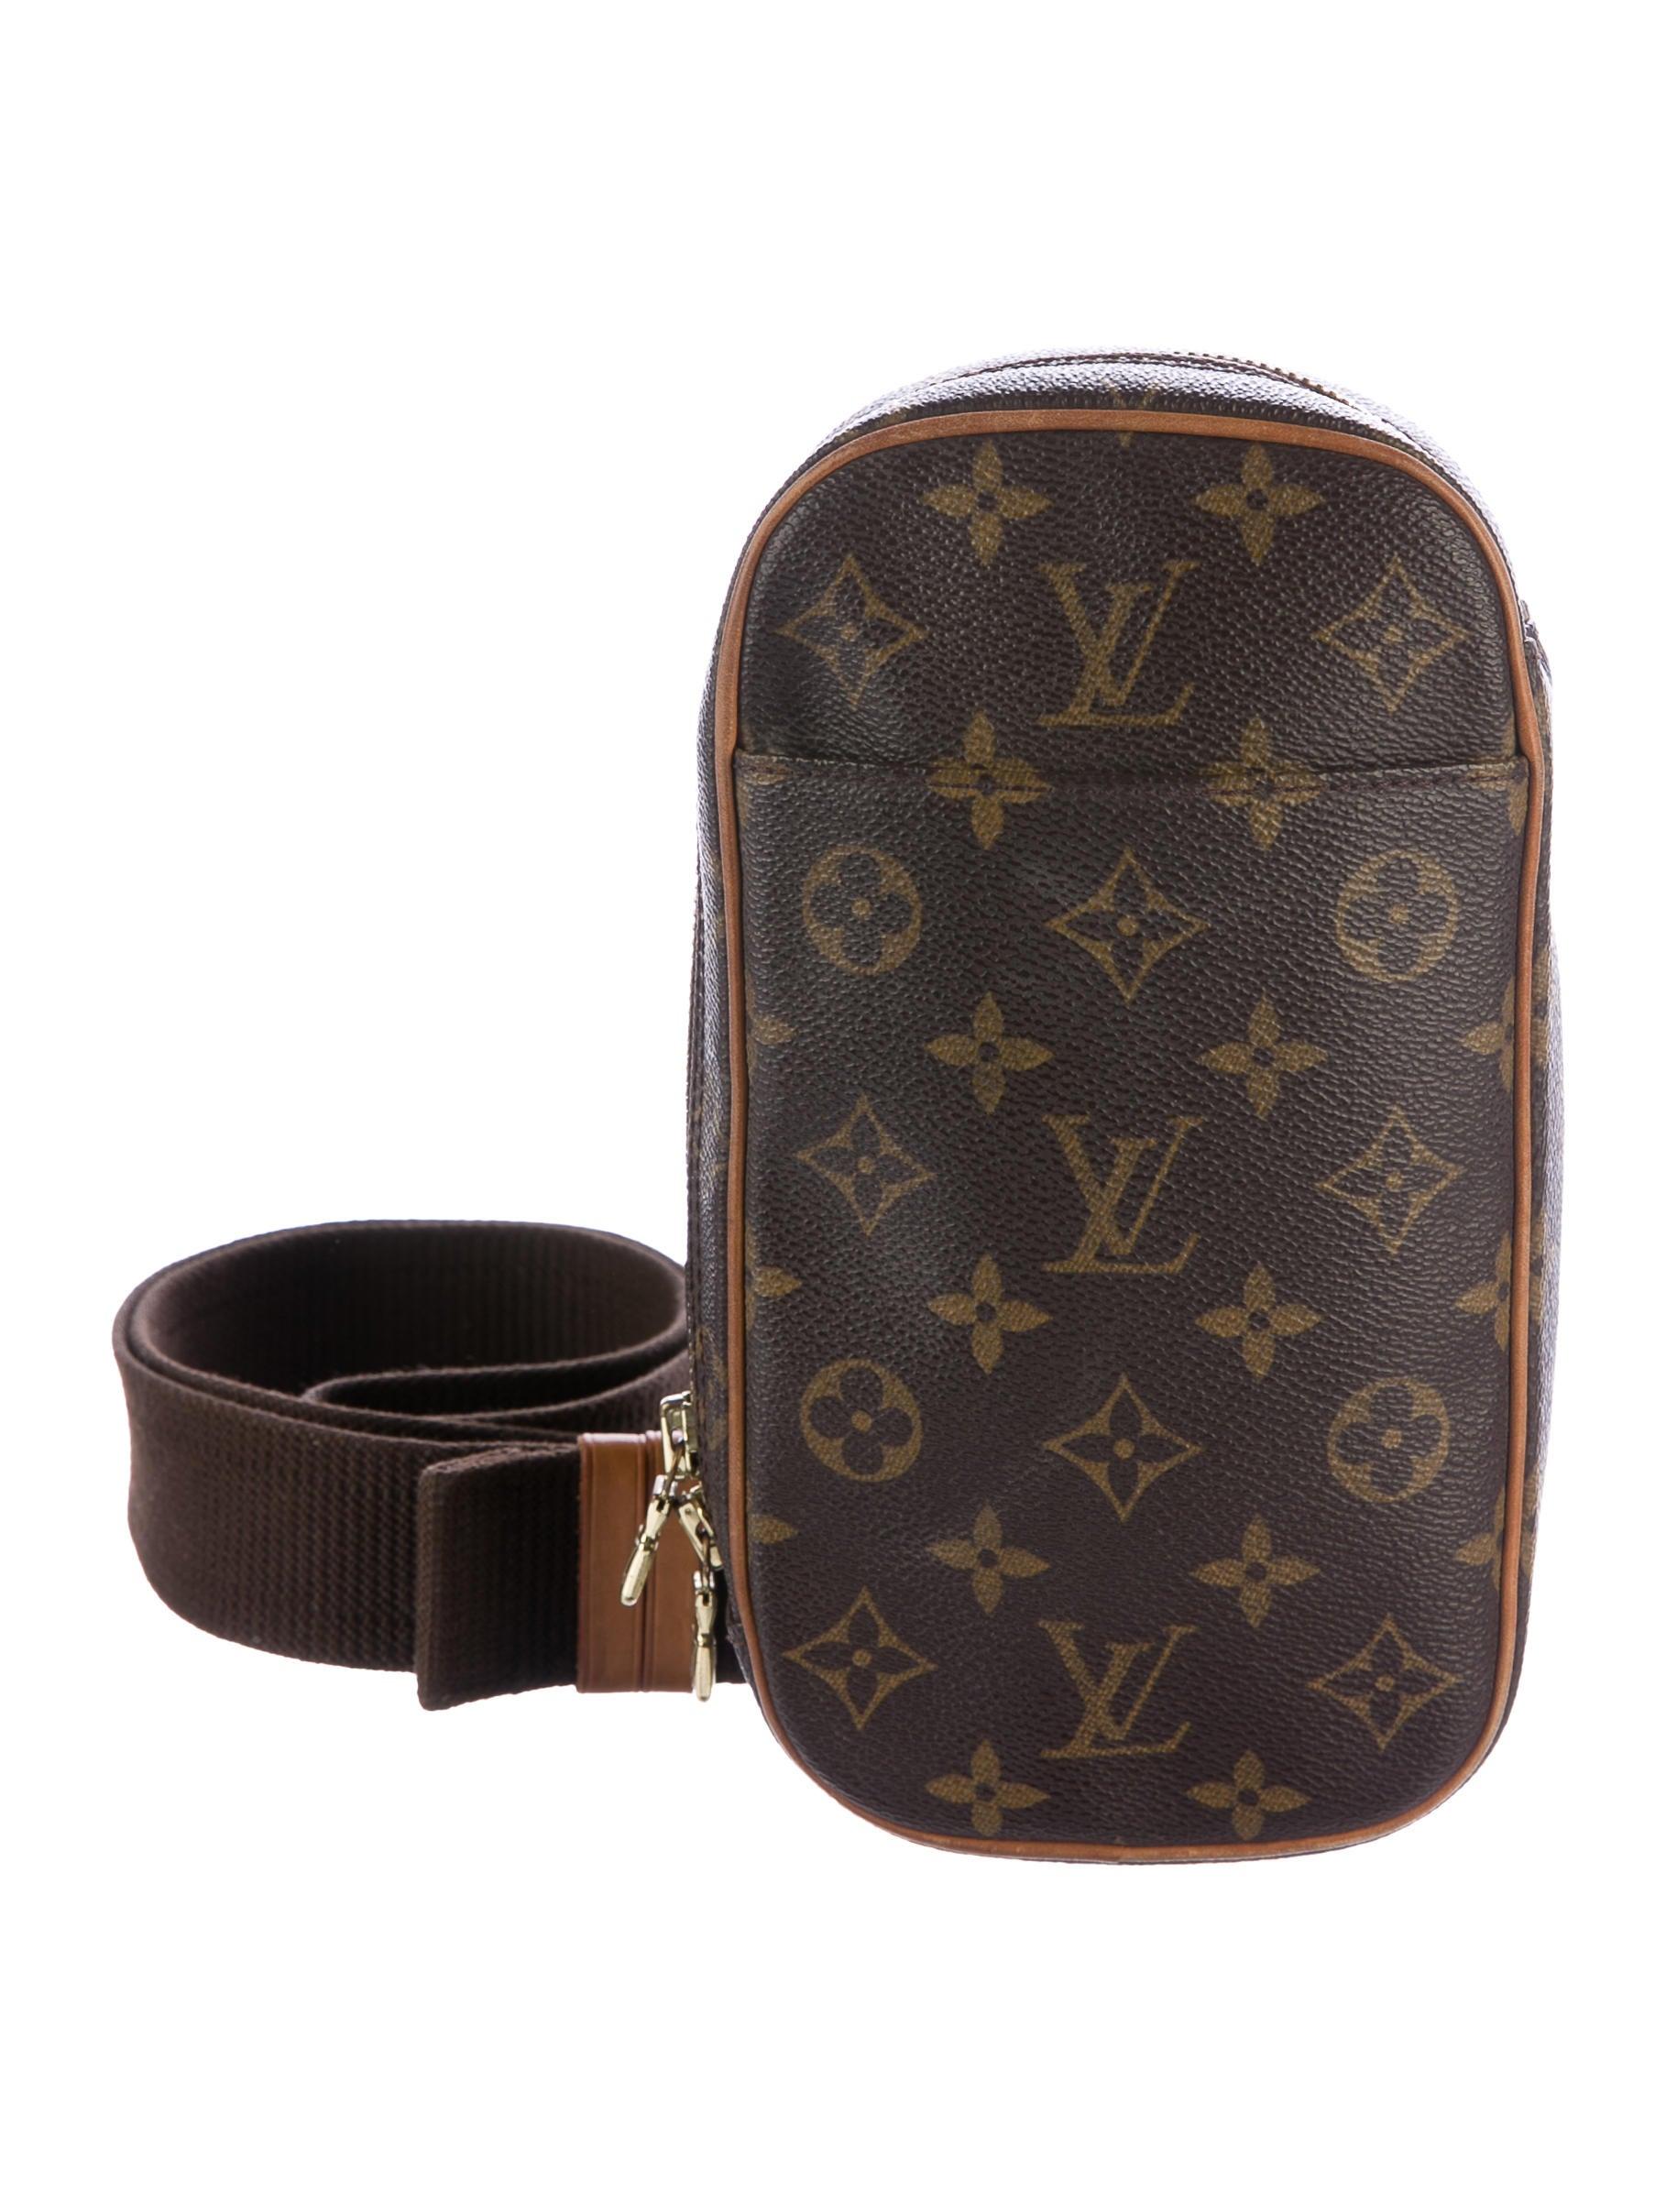 louis vuitton monogram pochette gange - handbags